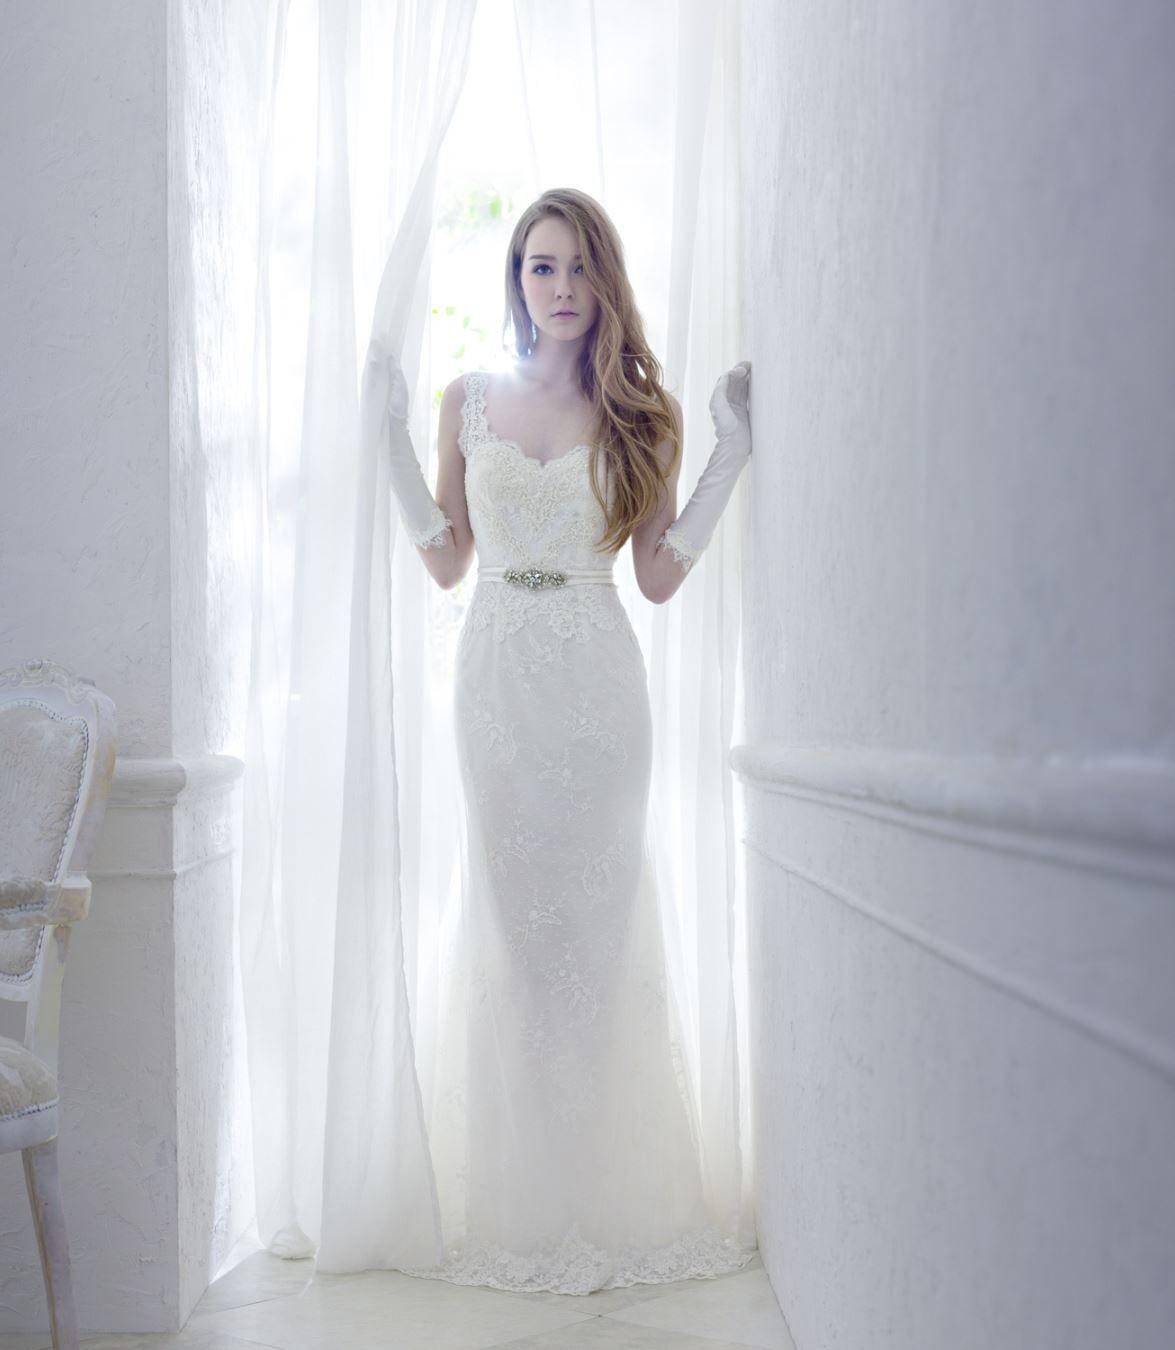 Couture wedding dresses perth popular wedding dress 2017 wedding dresses perth vosoi ombrellifo Images